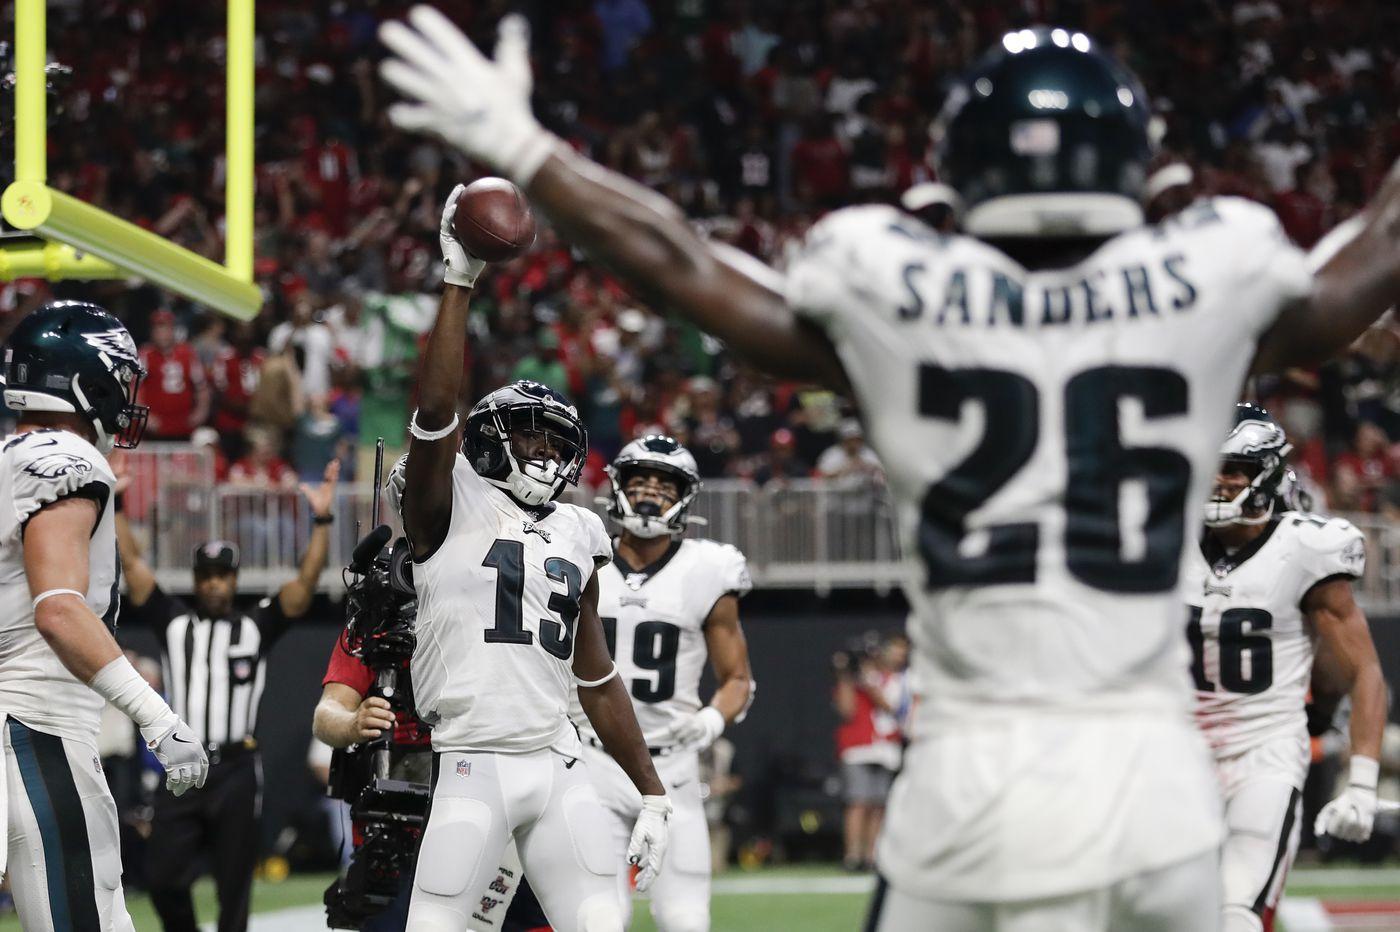 Social media reaction to Eagles-Falcons, Carson Wentz's magic, and Julio Jones' revenge